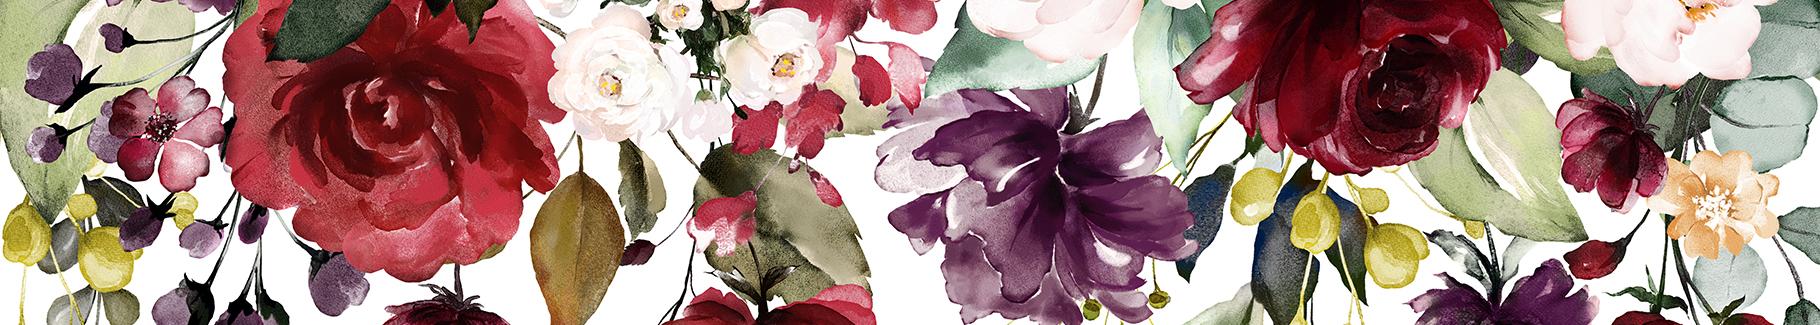 Plakat kwiat chryzantemy